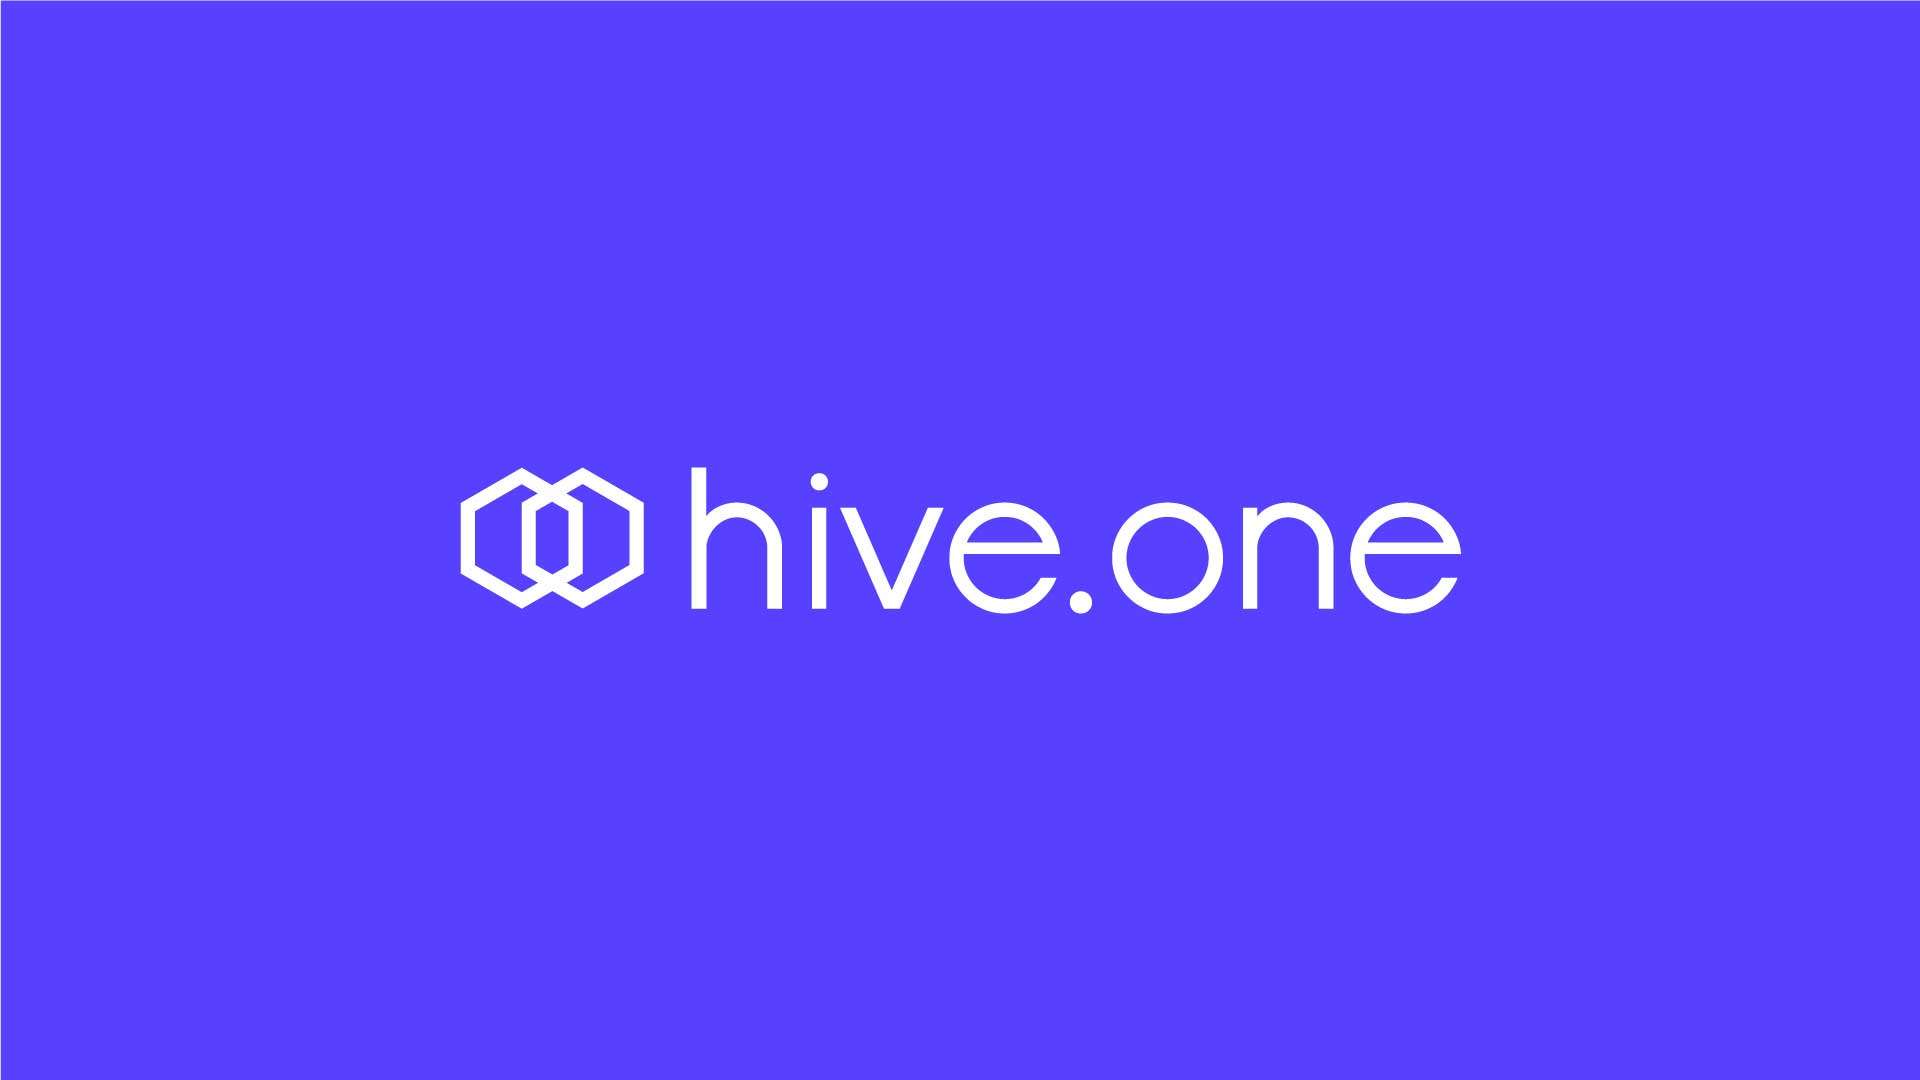 hive.one